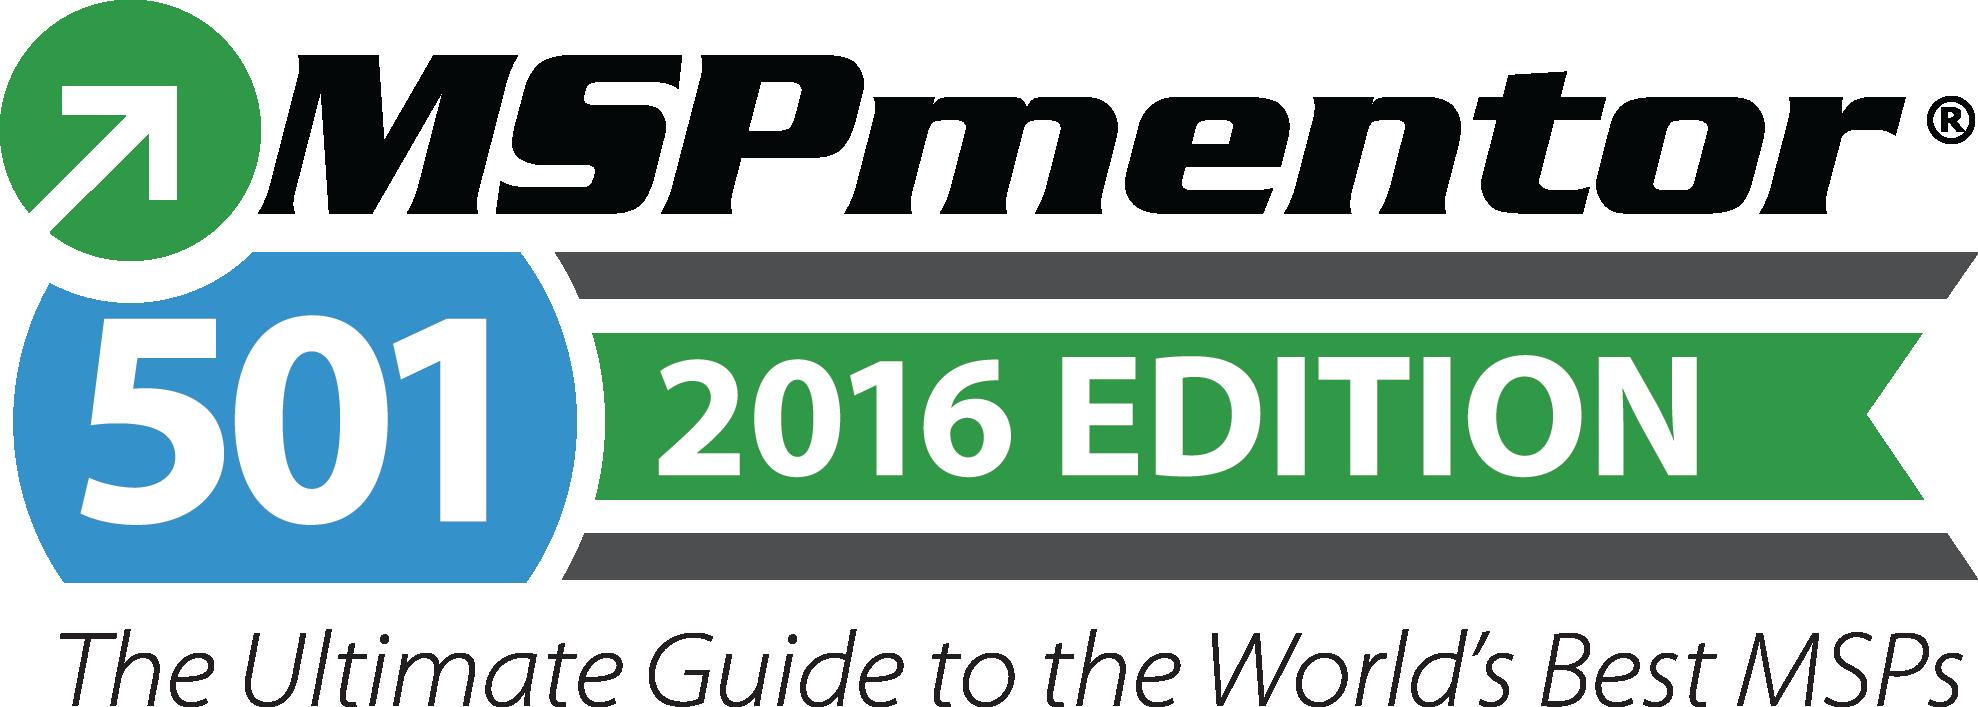 MSPmentor501_2016_Edition_CMYK_tagline.png